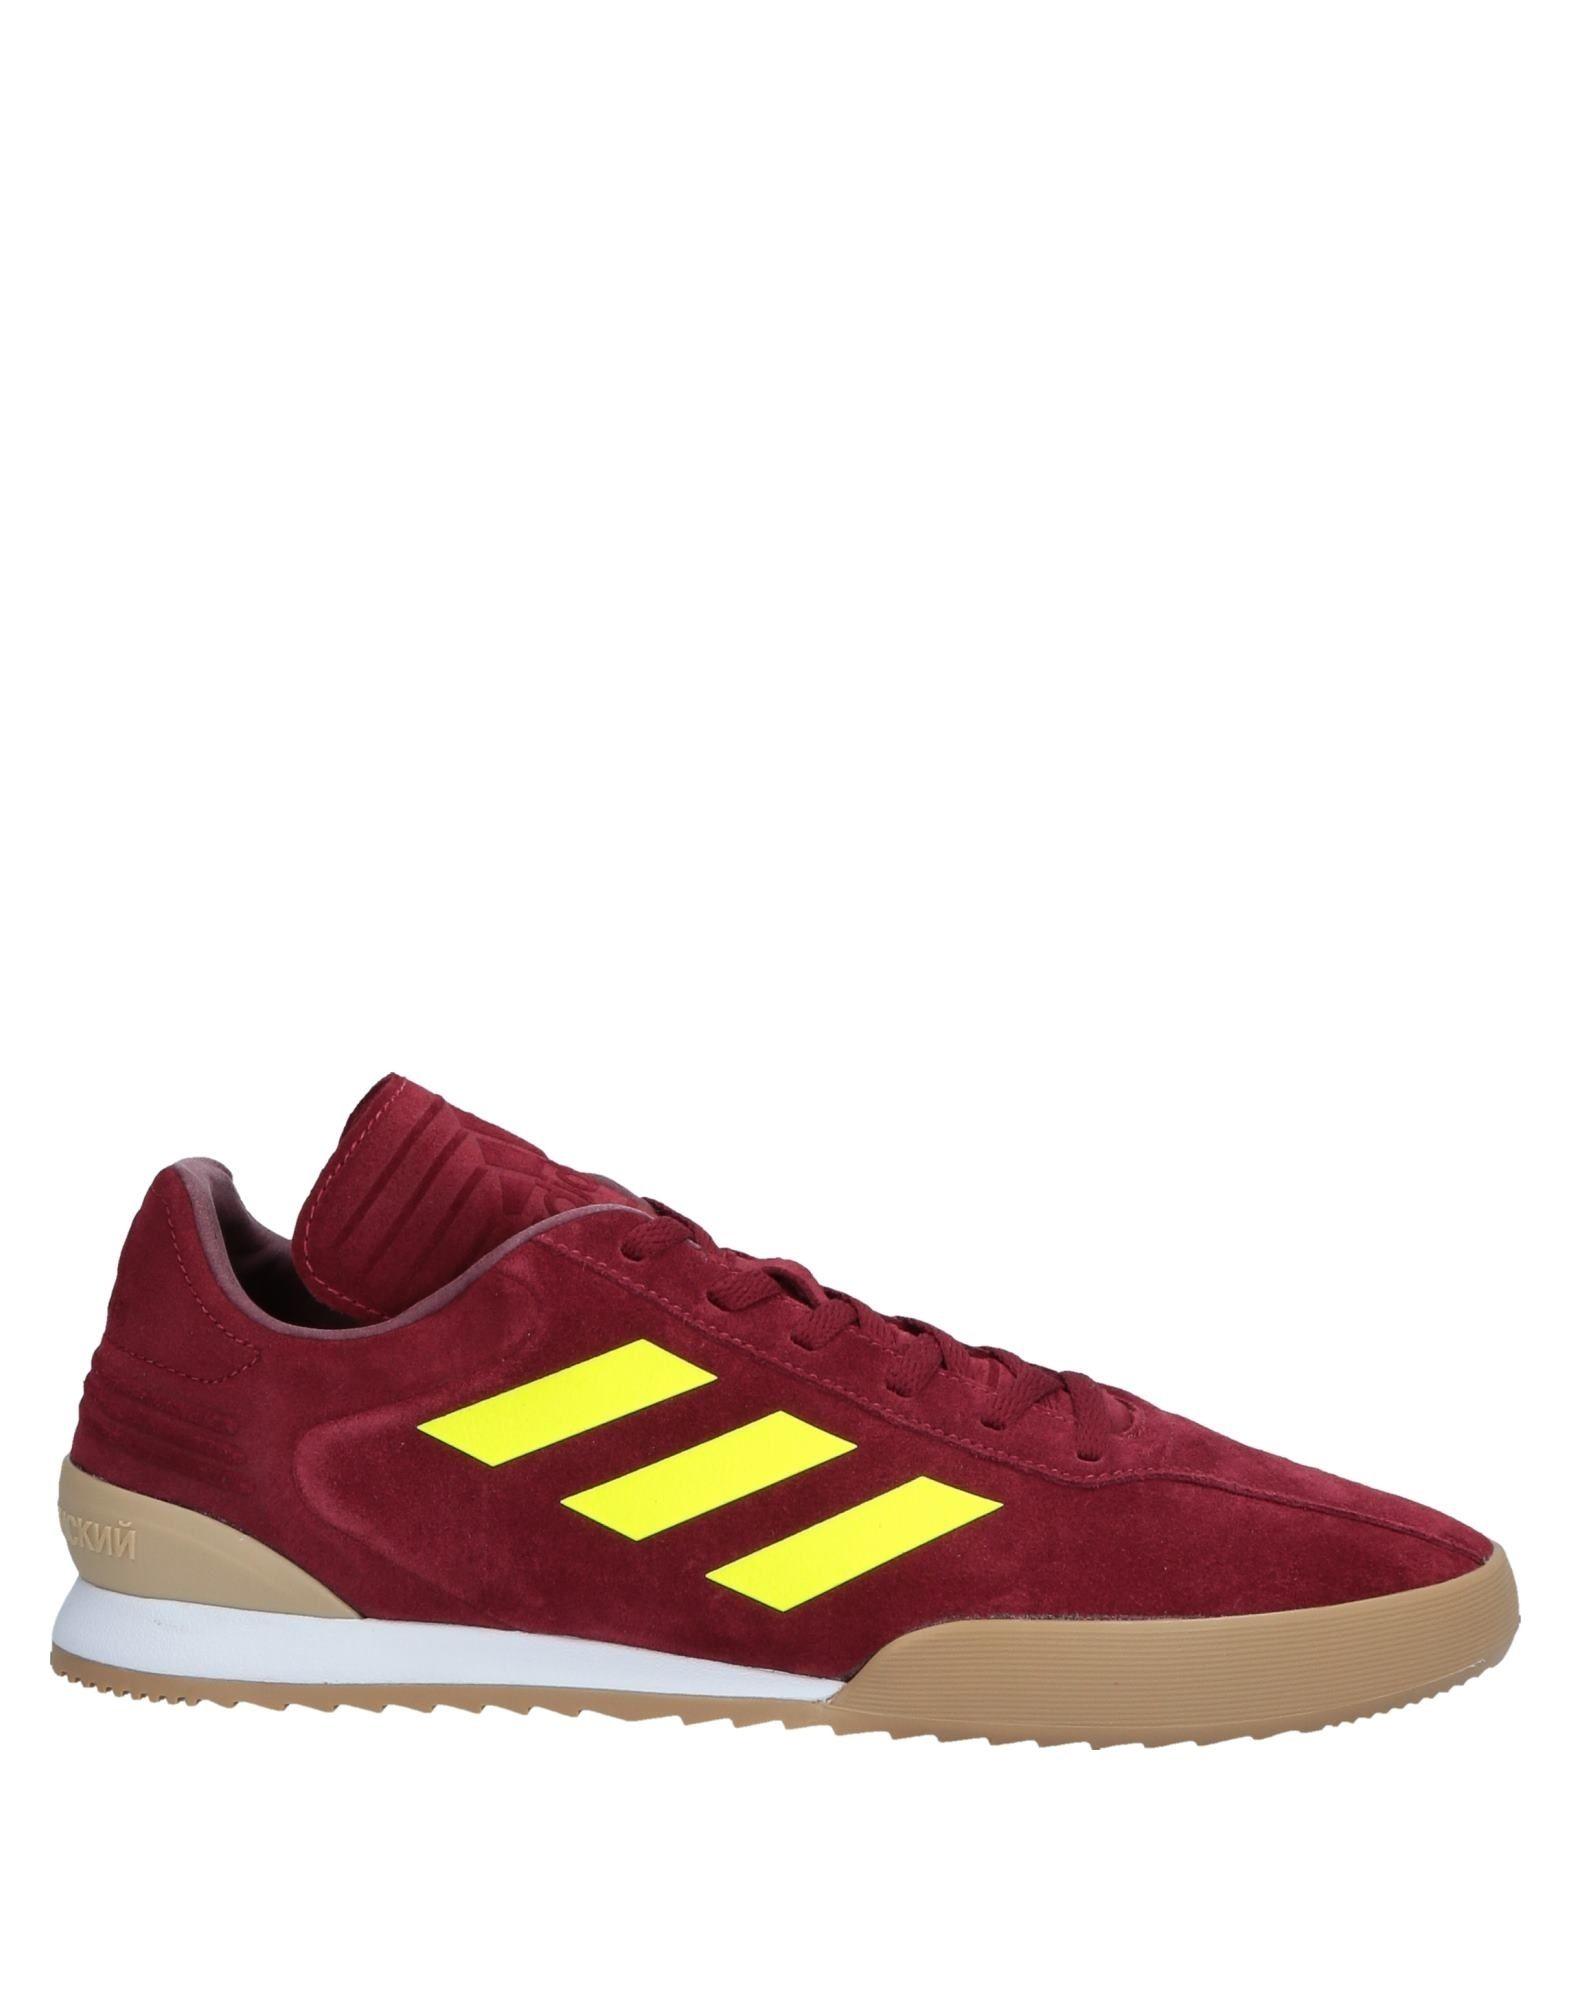 Rabatt echte Schuhe Adidas Turnschuhes Herren 11571204CE